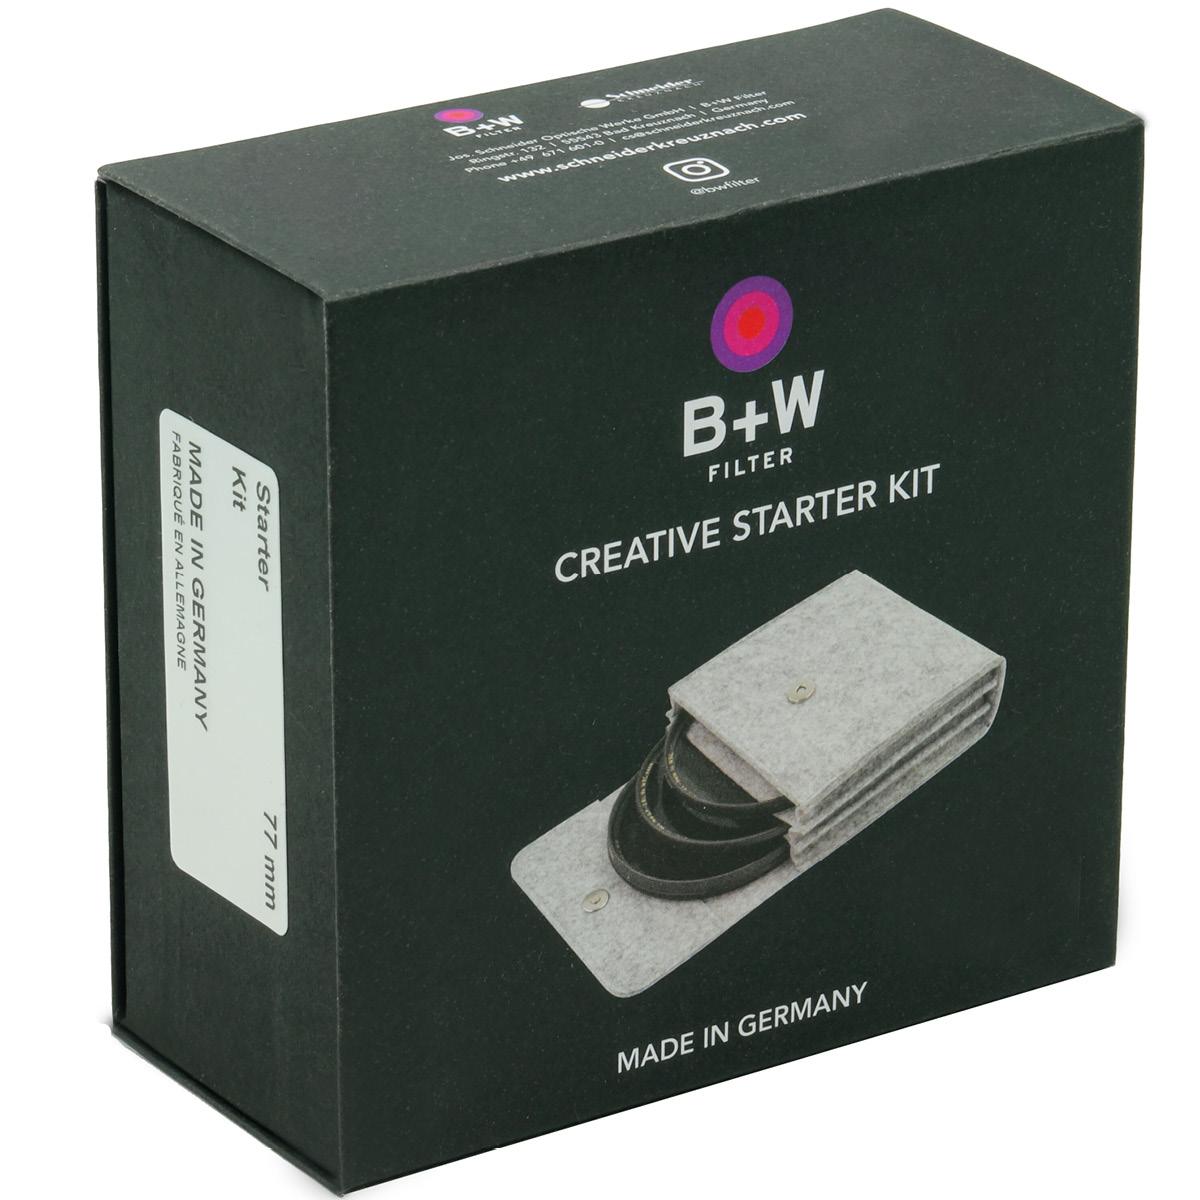 B+W Creative Starter Kit 43 mm